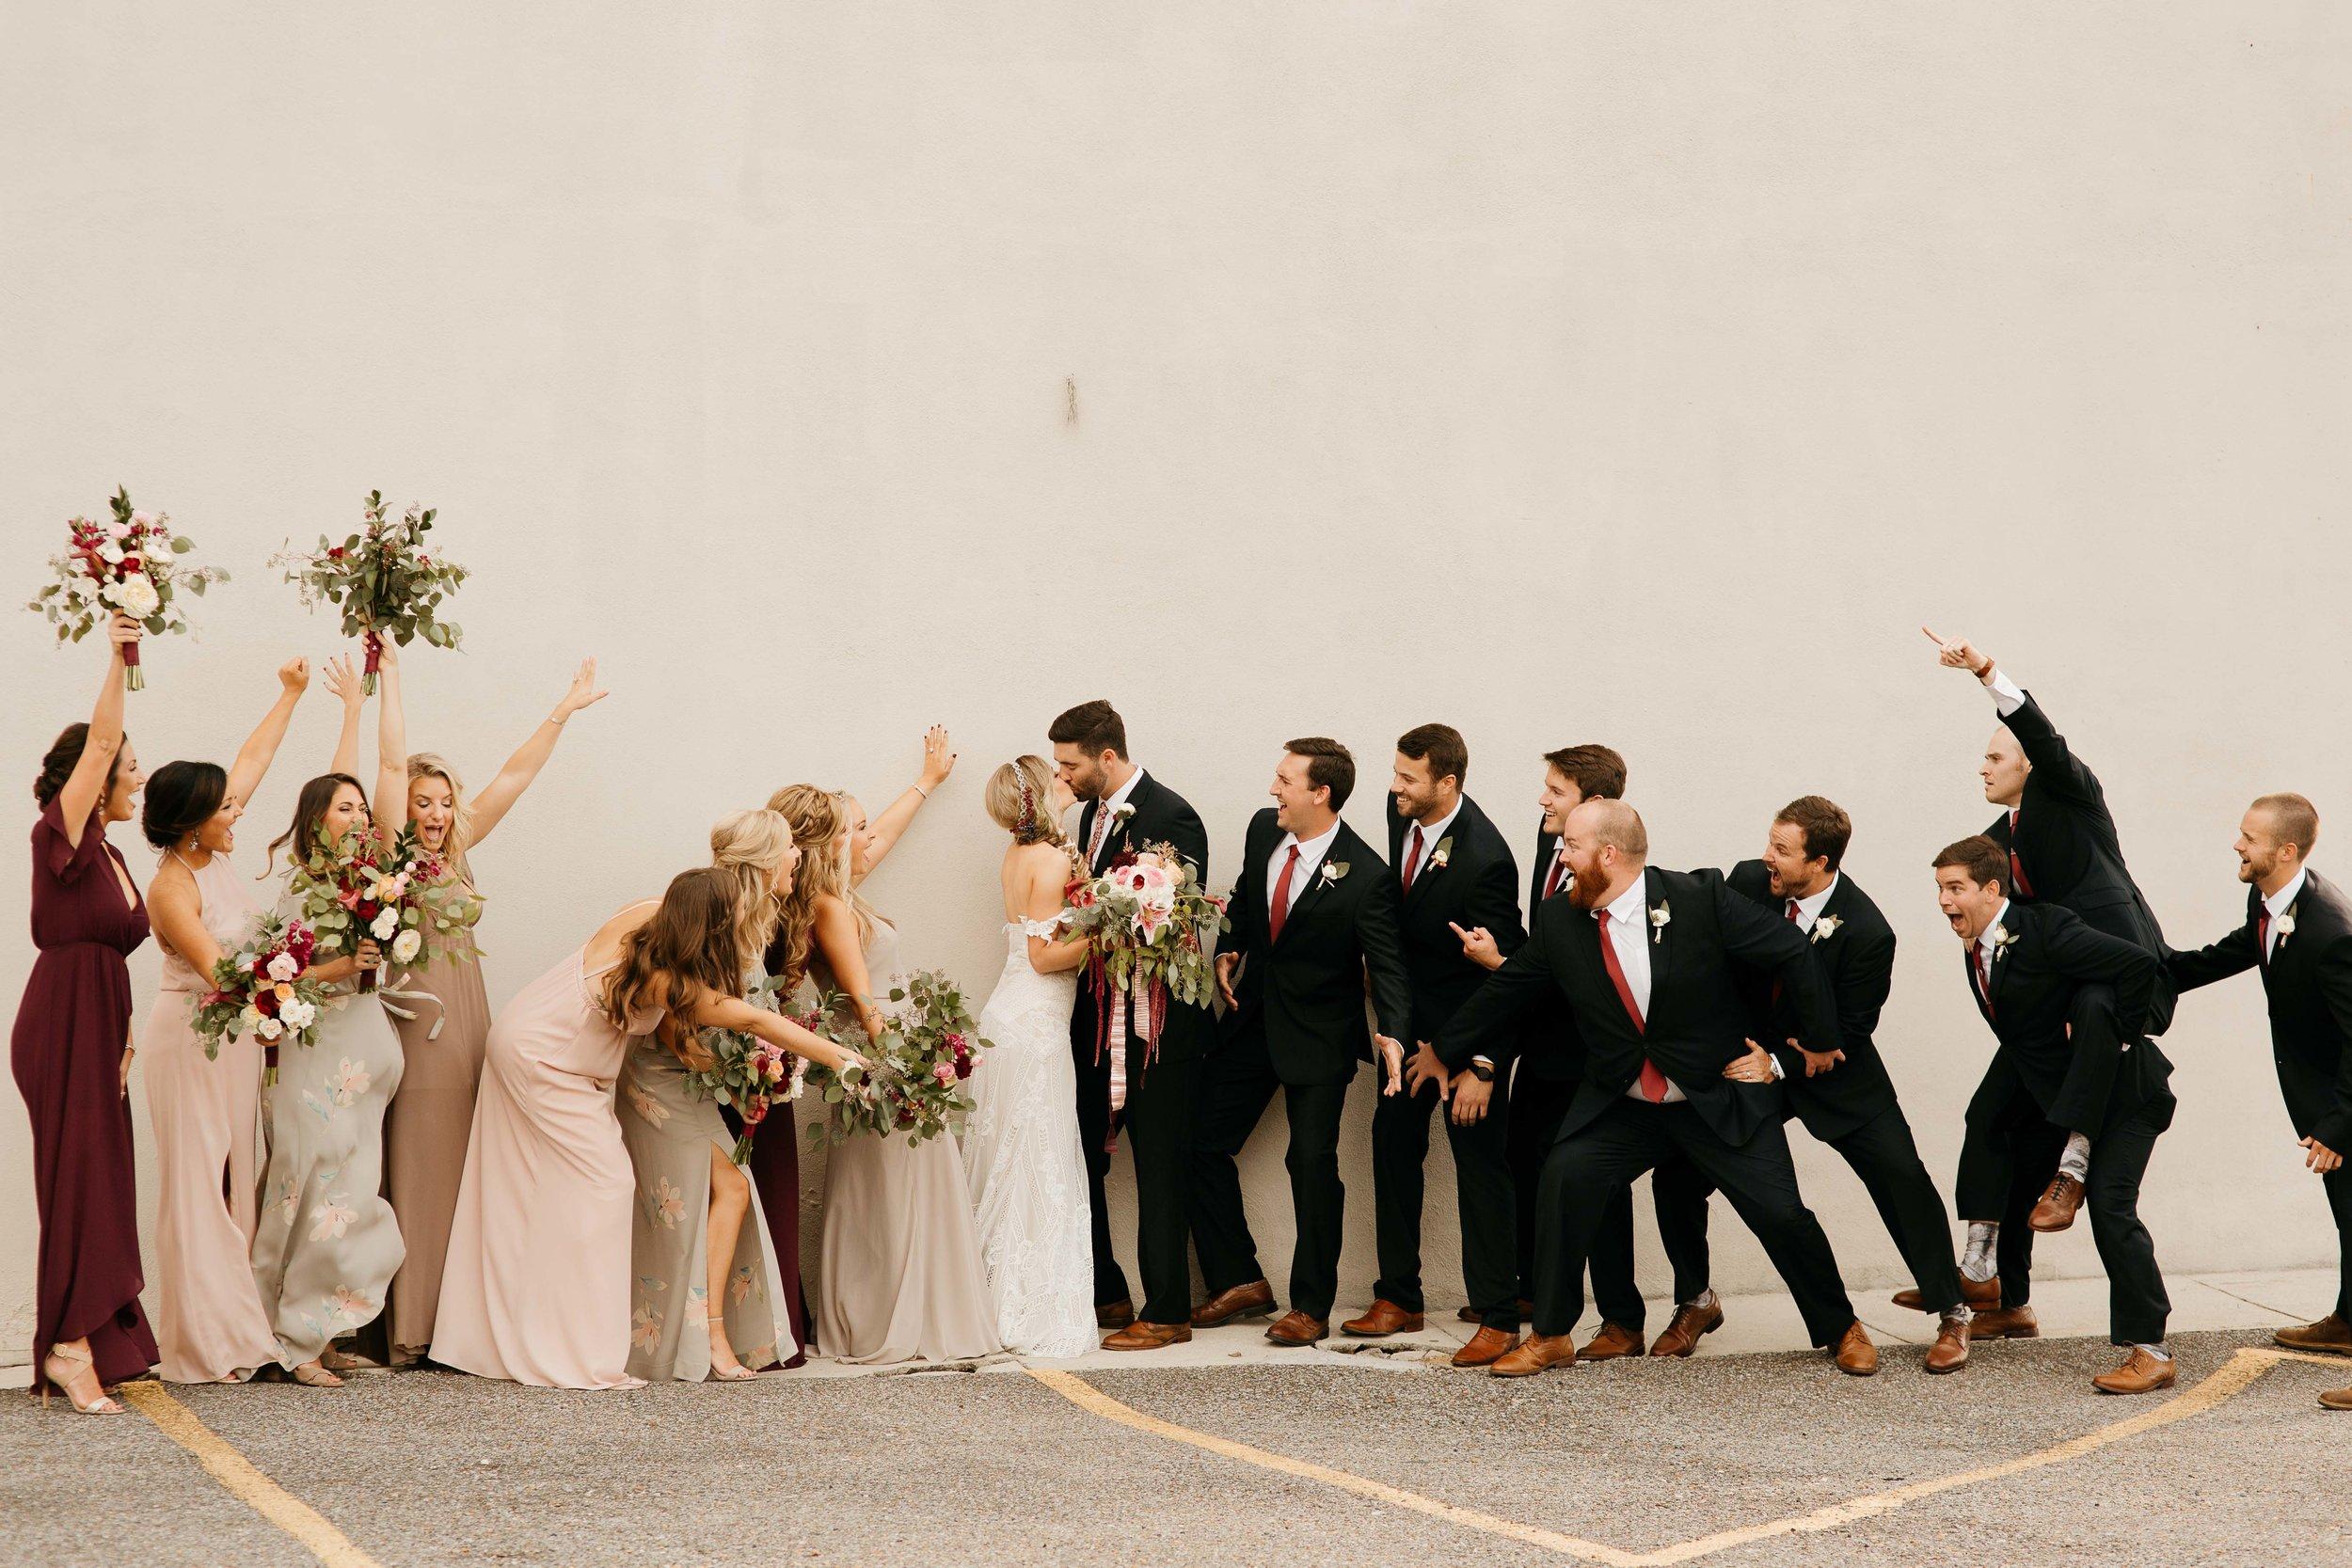 memphis tn wedding-40.jpg